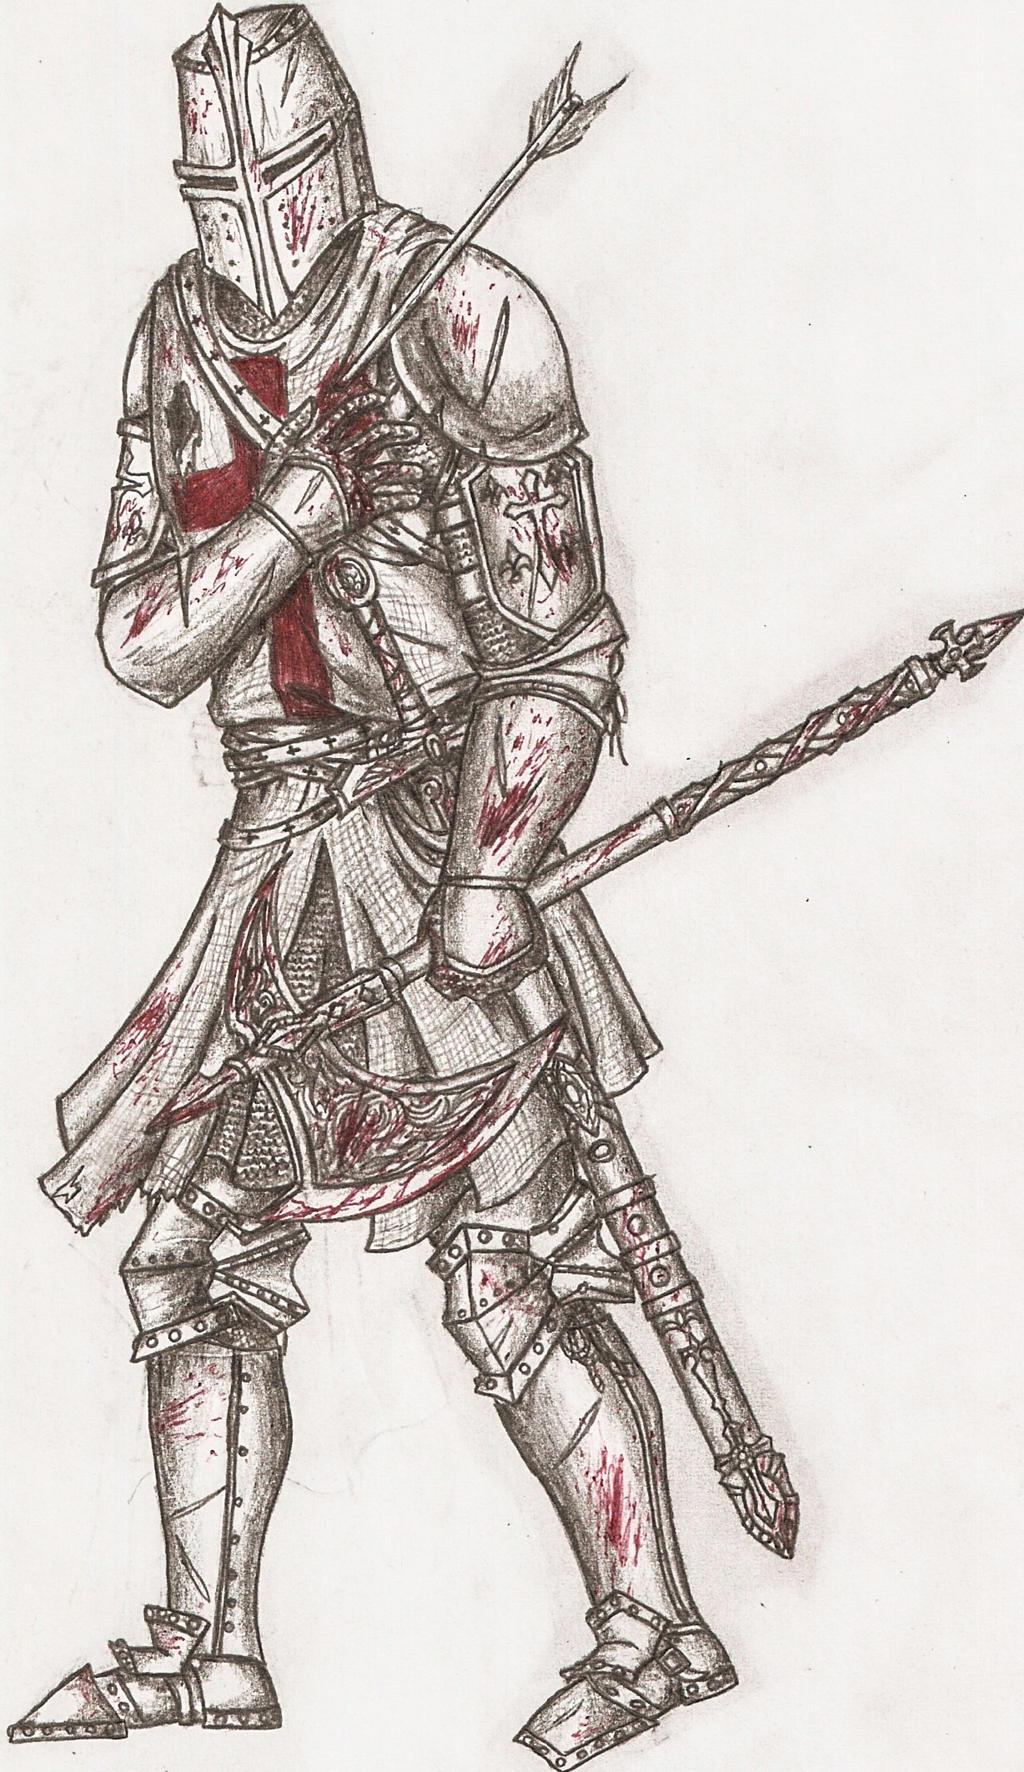 Temple Knight(Templar) by SPARTANalexandra on DeviantArt